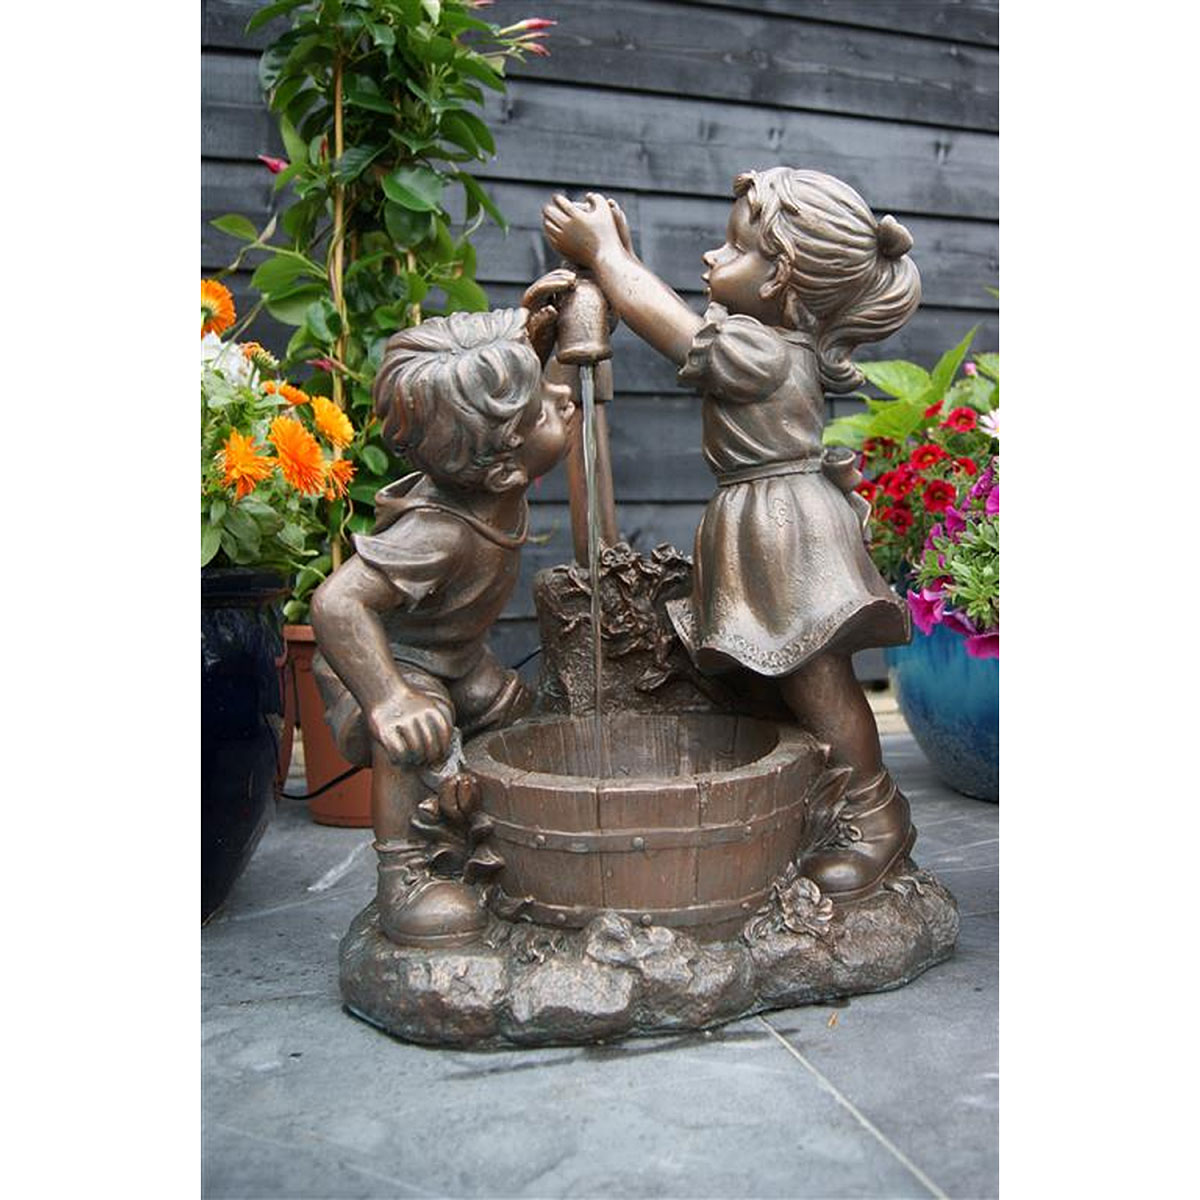 "Gartendekoration - Wasserspiel Set ""Memphis"" inkl. Pumpe  - Onlineshop Hellweg"